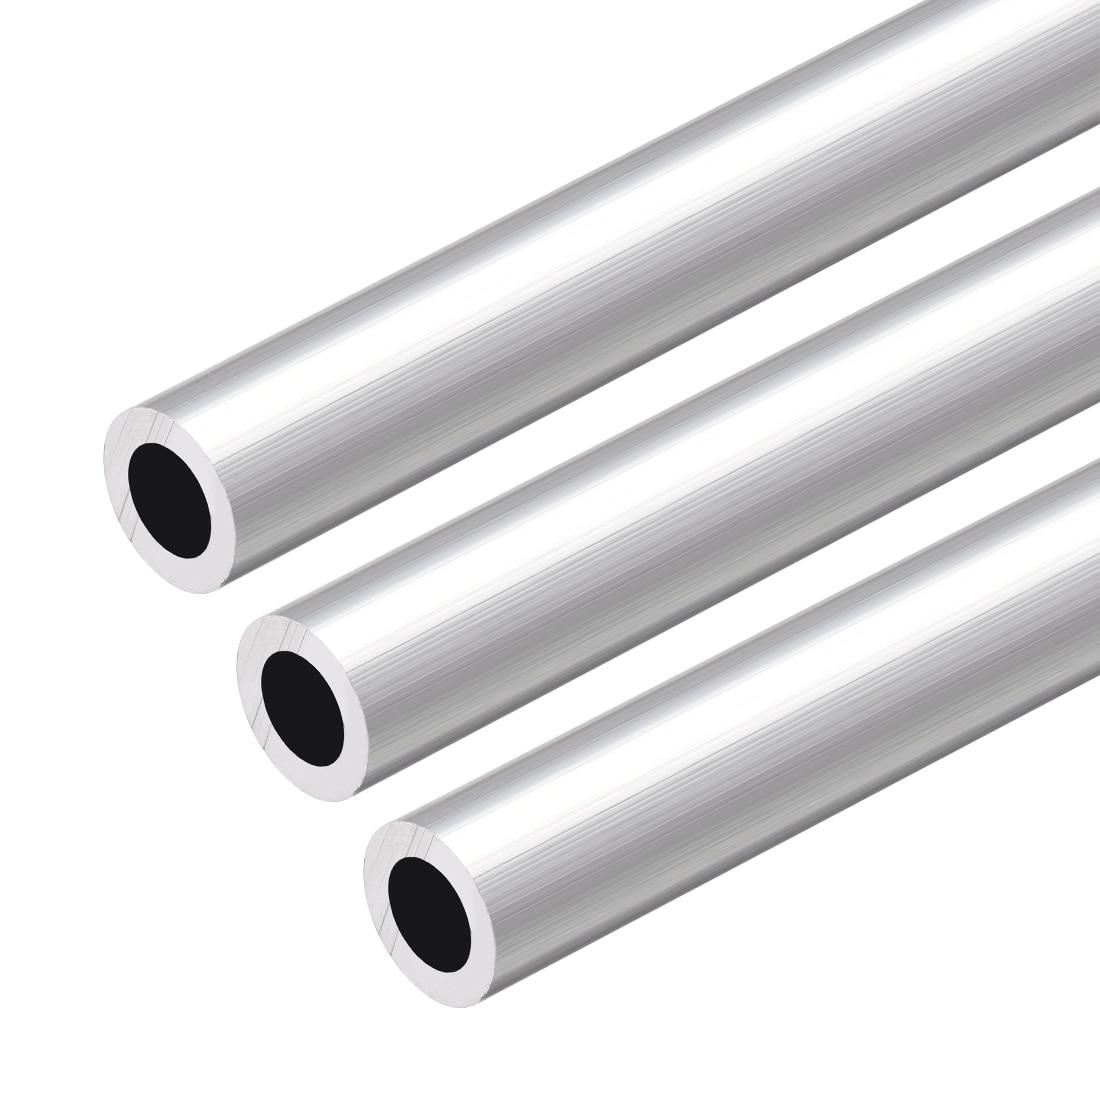 Uxcell 6063 Aluminum Round Tube 300mm Length 13mm OD 8mm Inner Dia Seamless Aluminum Straight Tubing 3 Pcs